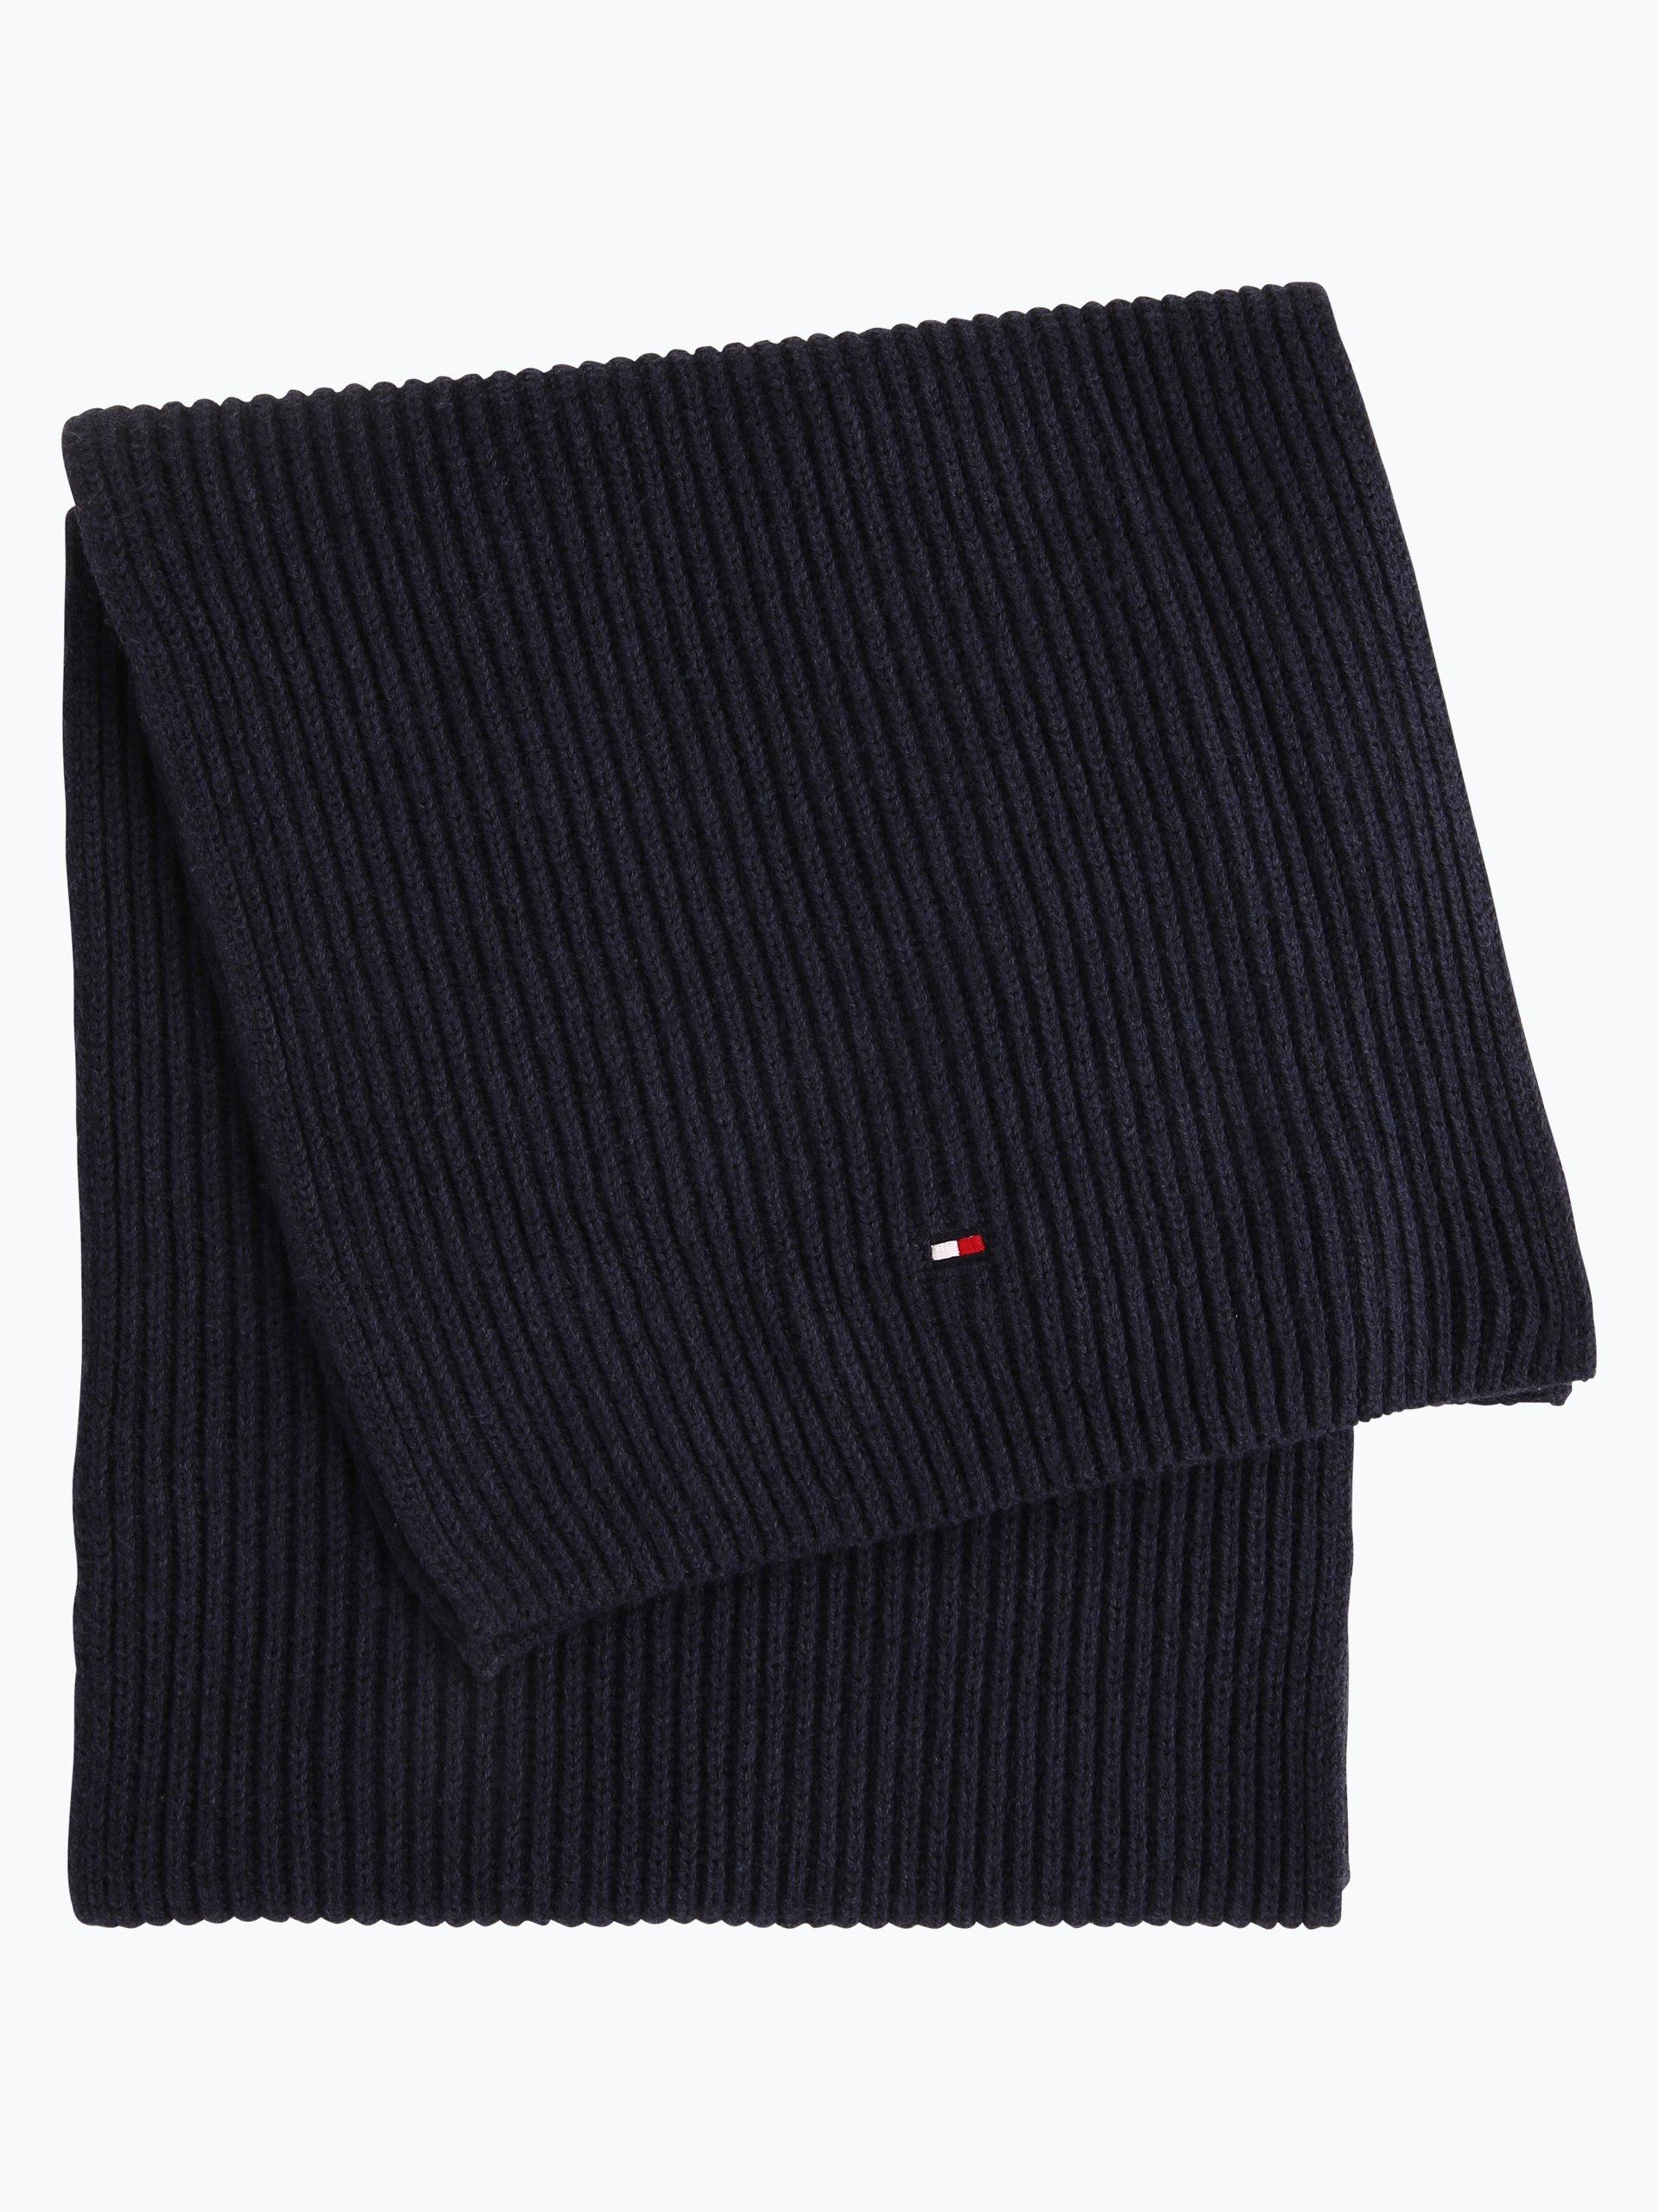 tommy hilfiger herren schal mit cashmere anteil blau. Black Bedroom Furniture Sets. Home Design Ideas